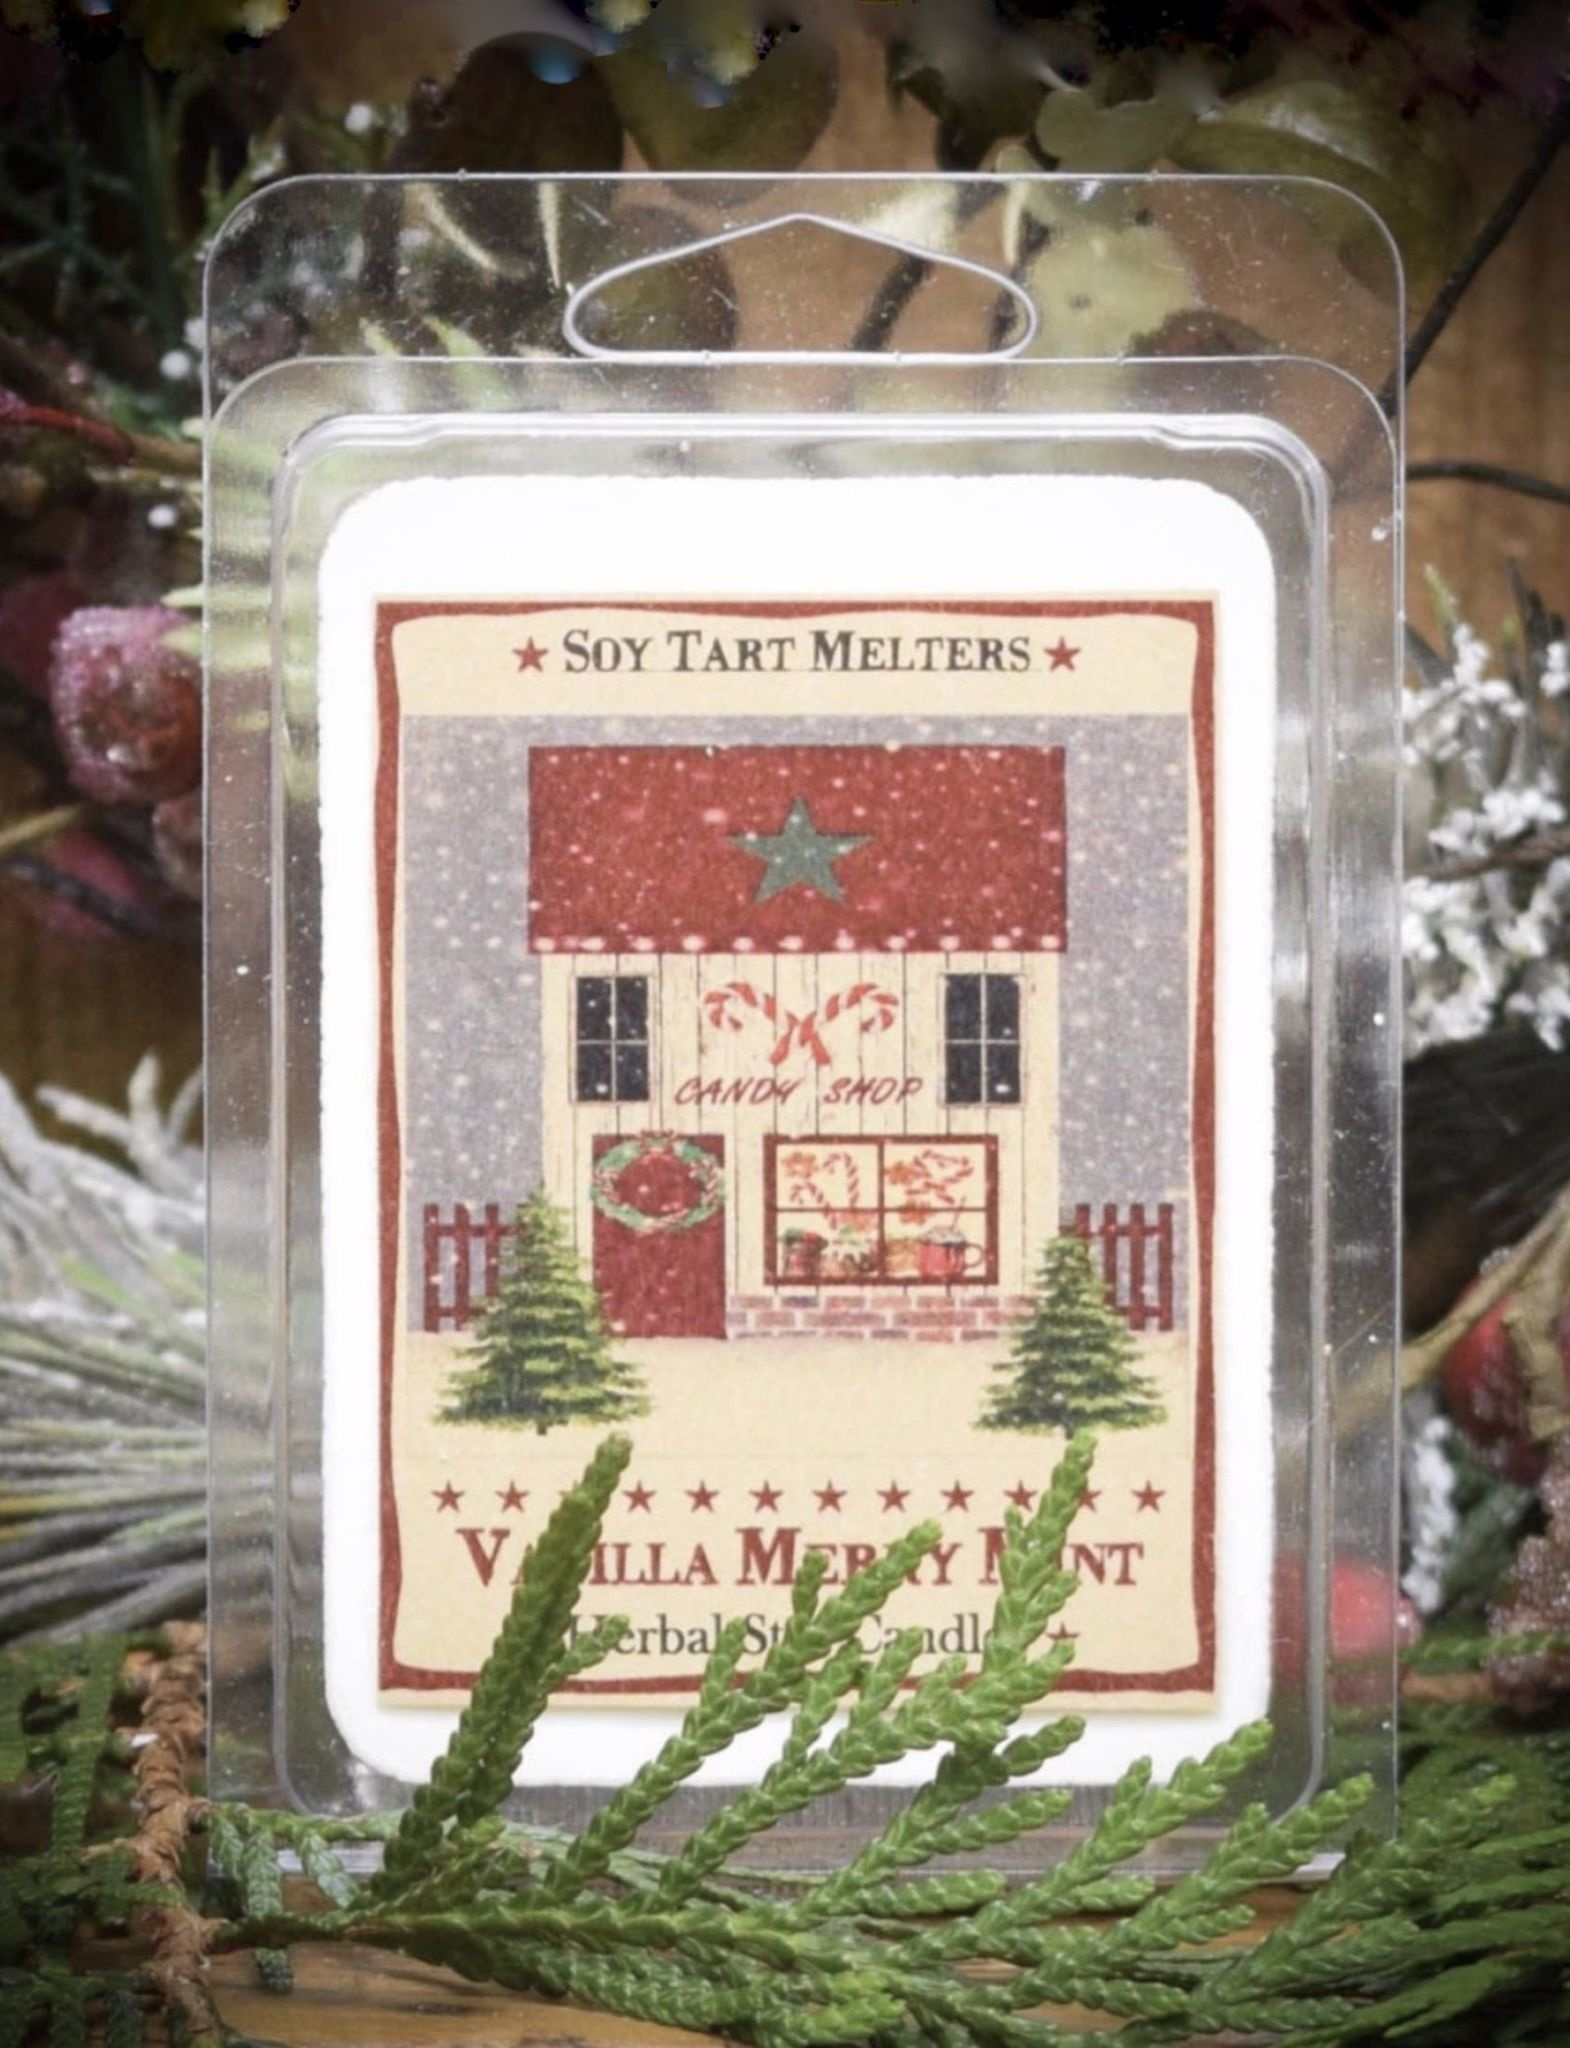 Herbal Star Candles Vanilla Merry Mint Mini Pack of Tarts